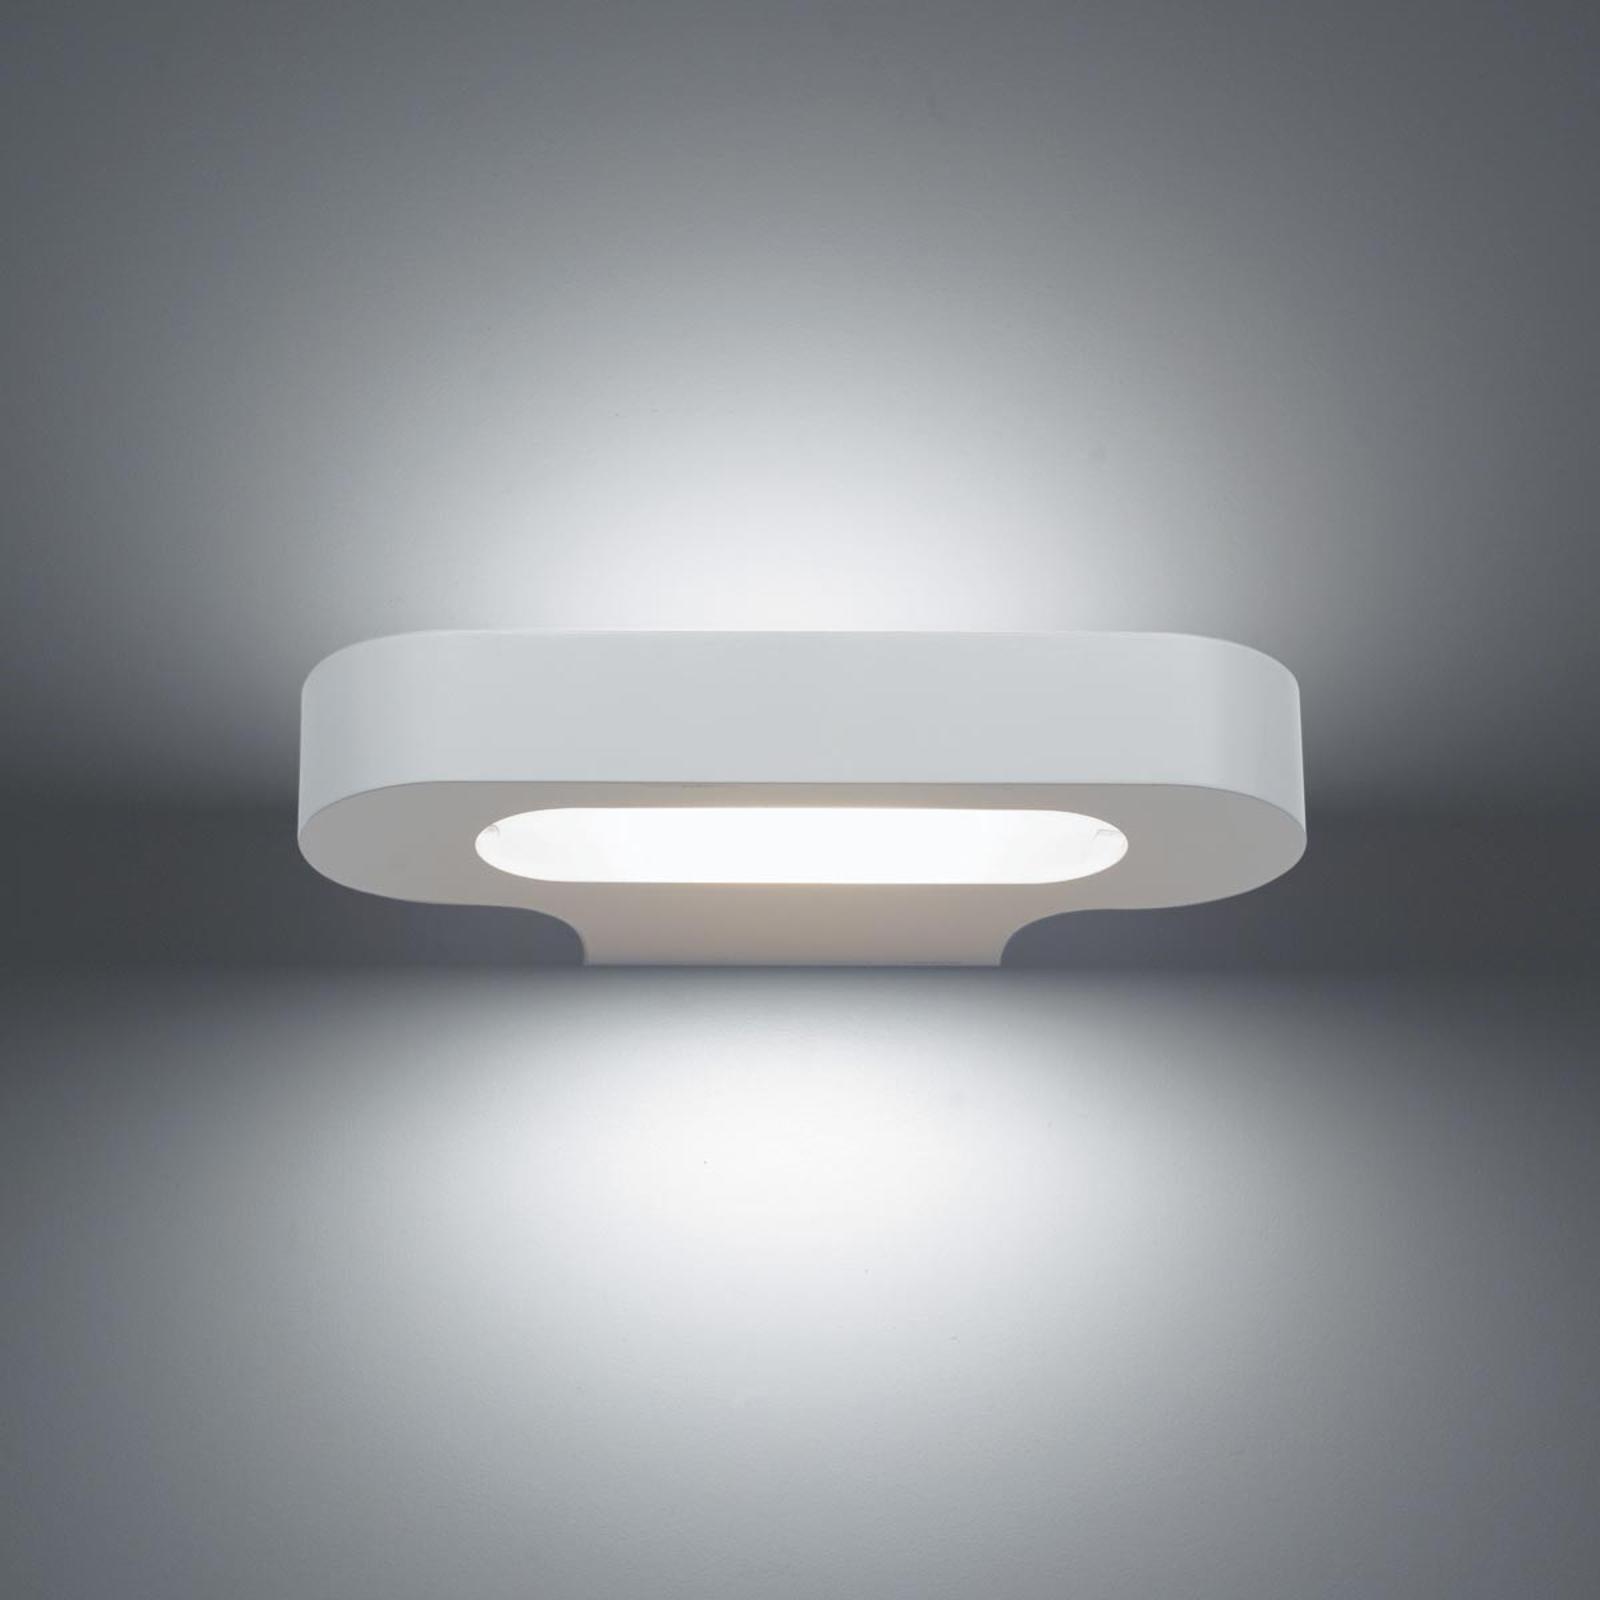 Artemide Talo LED-vegglampe 21cm hvit 2700K